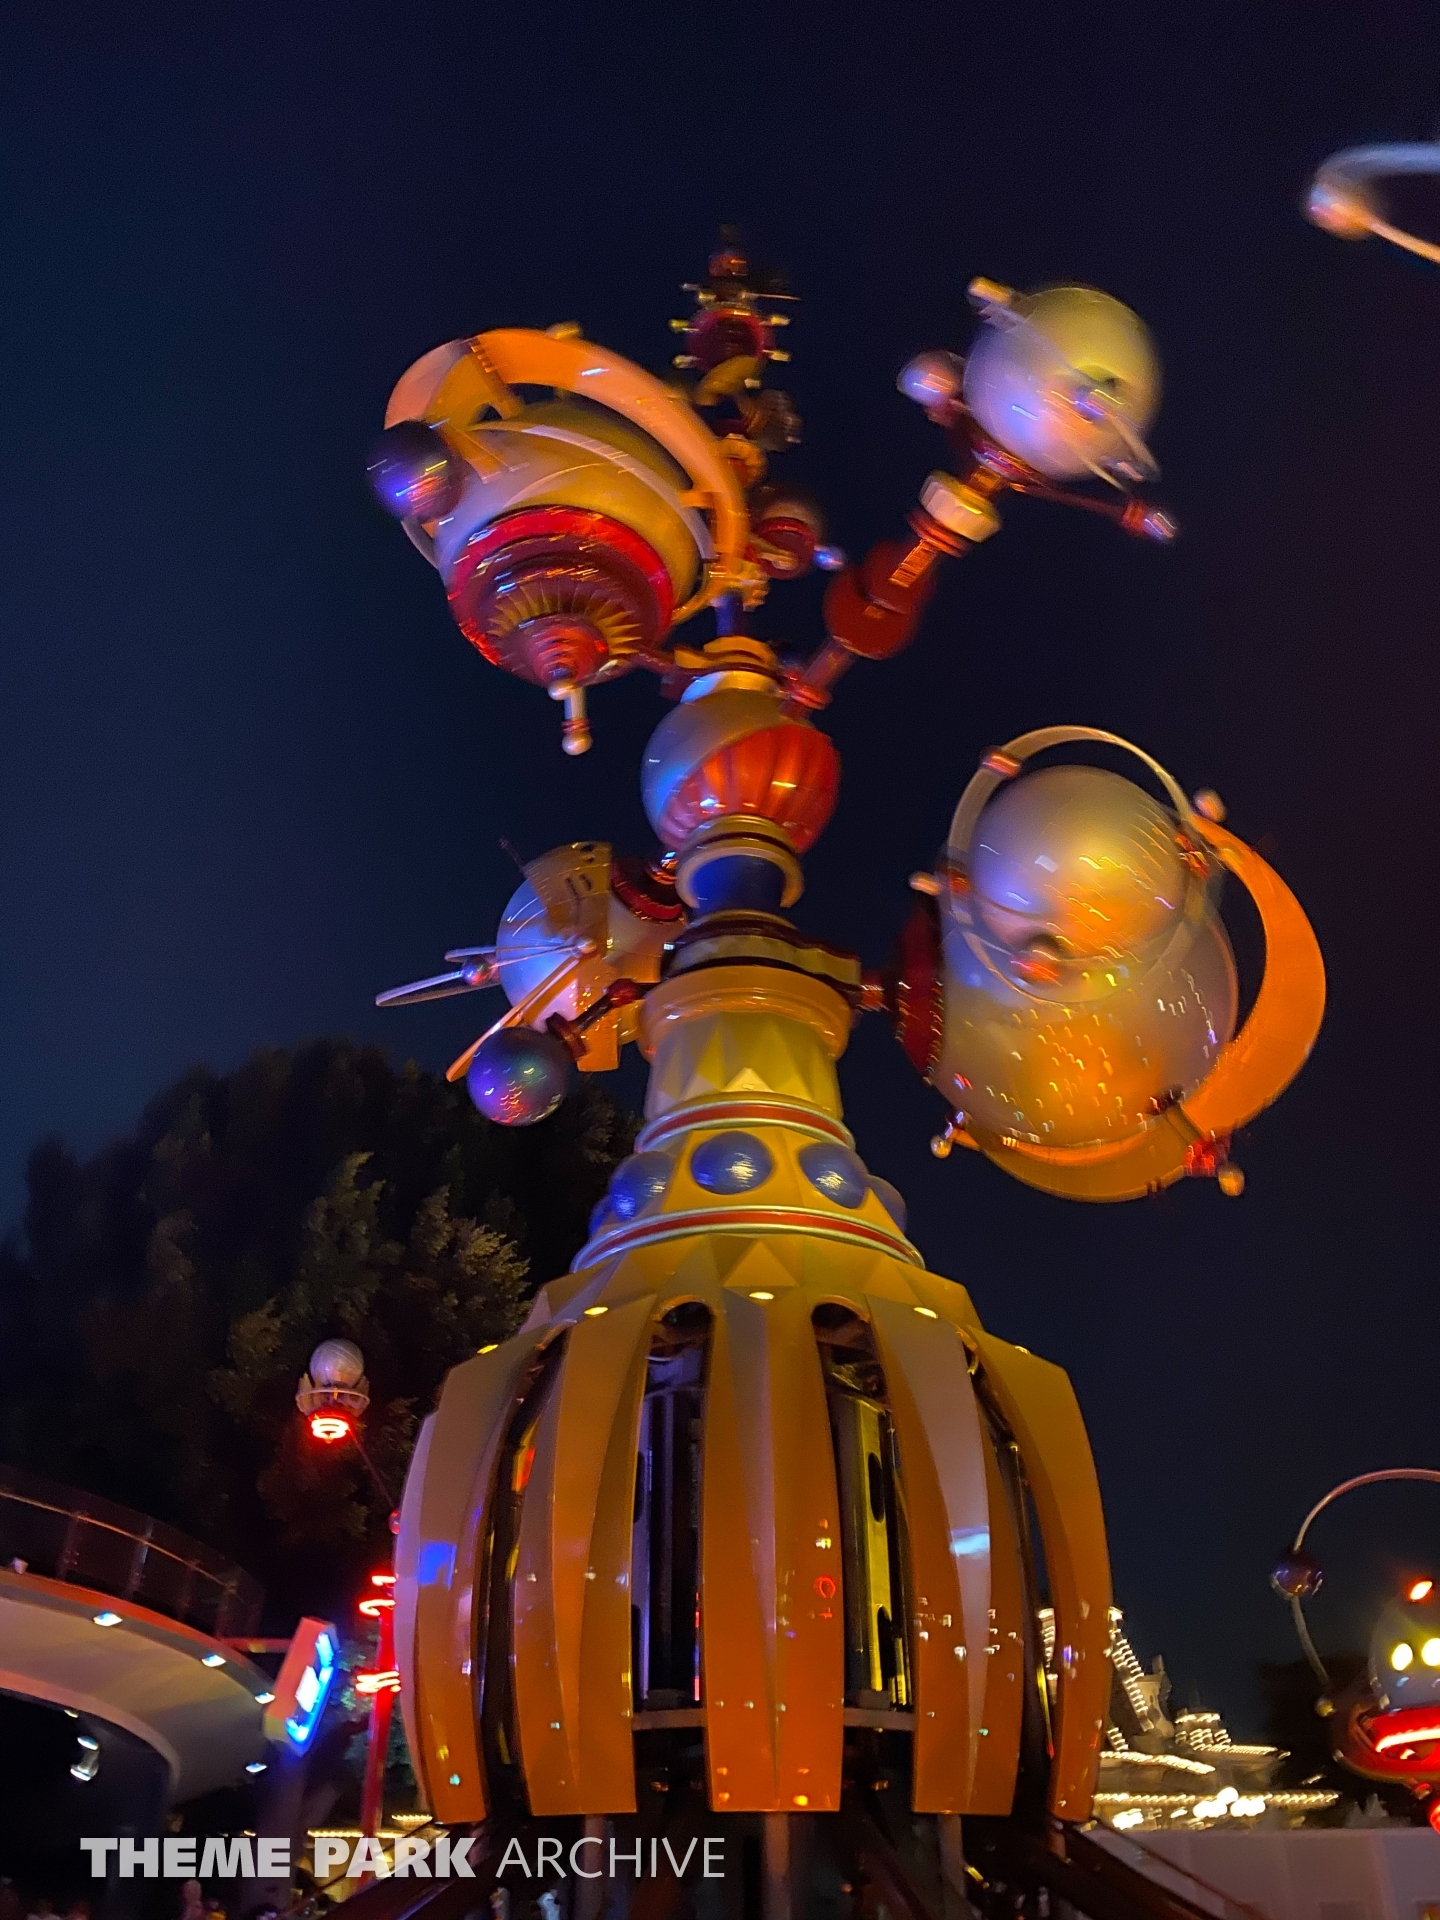 Astro Orbiter at Disneyland